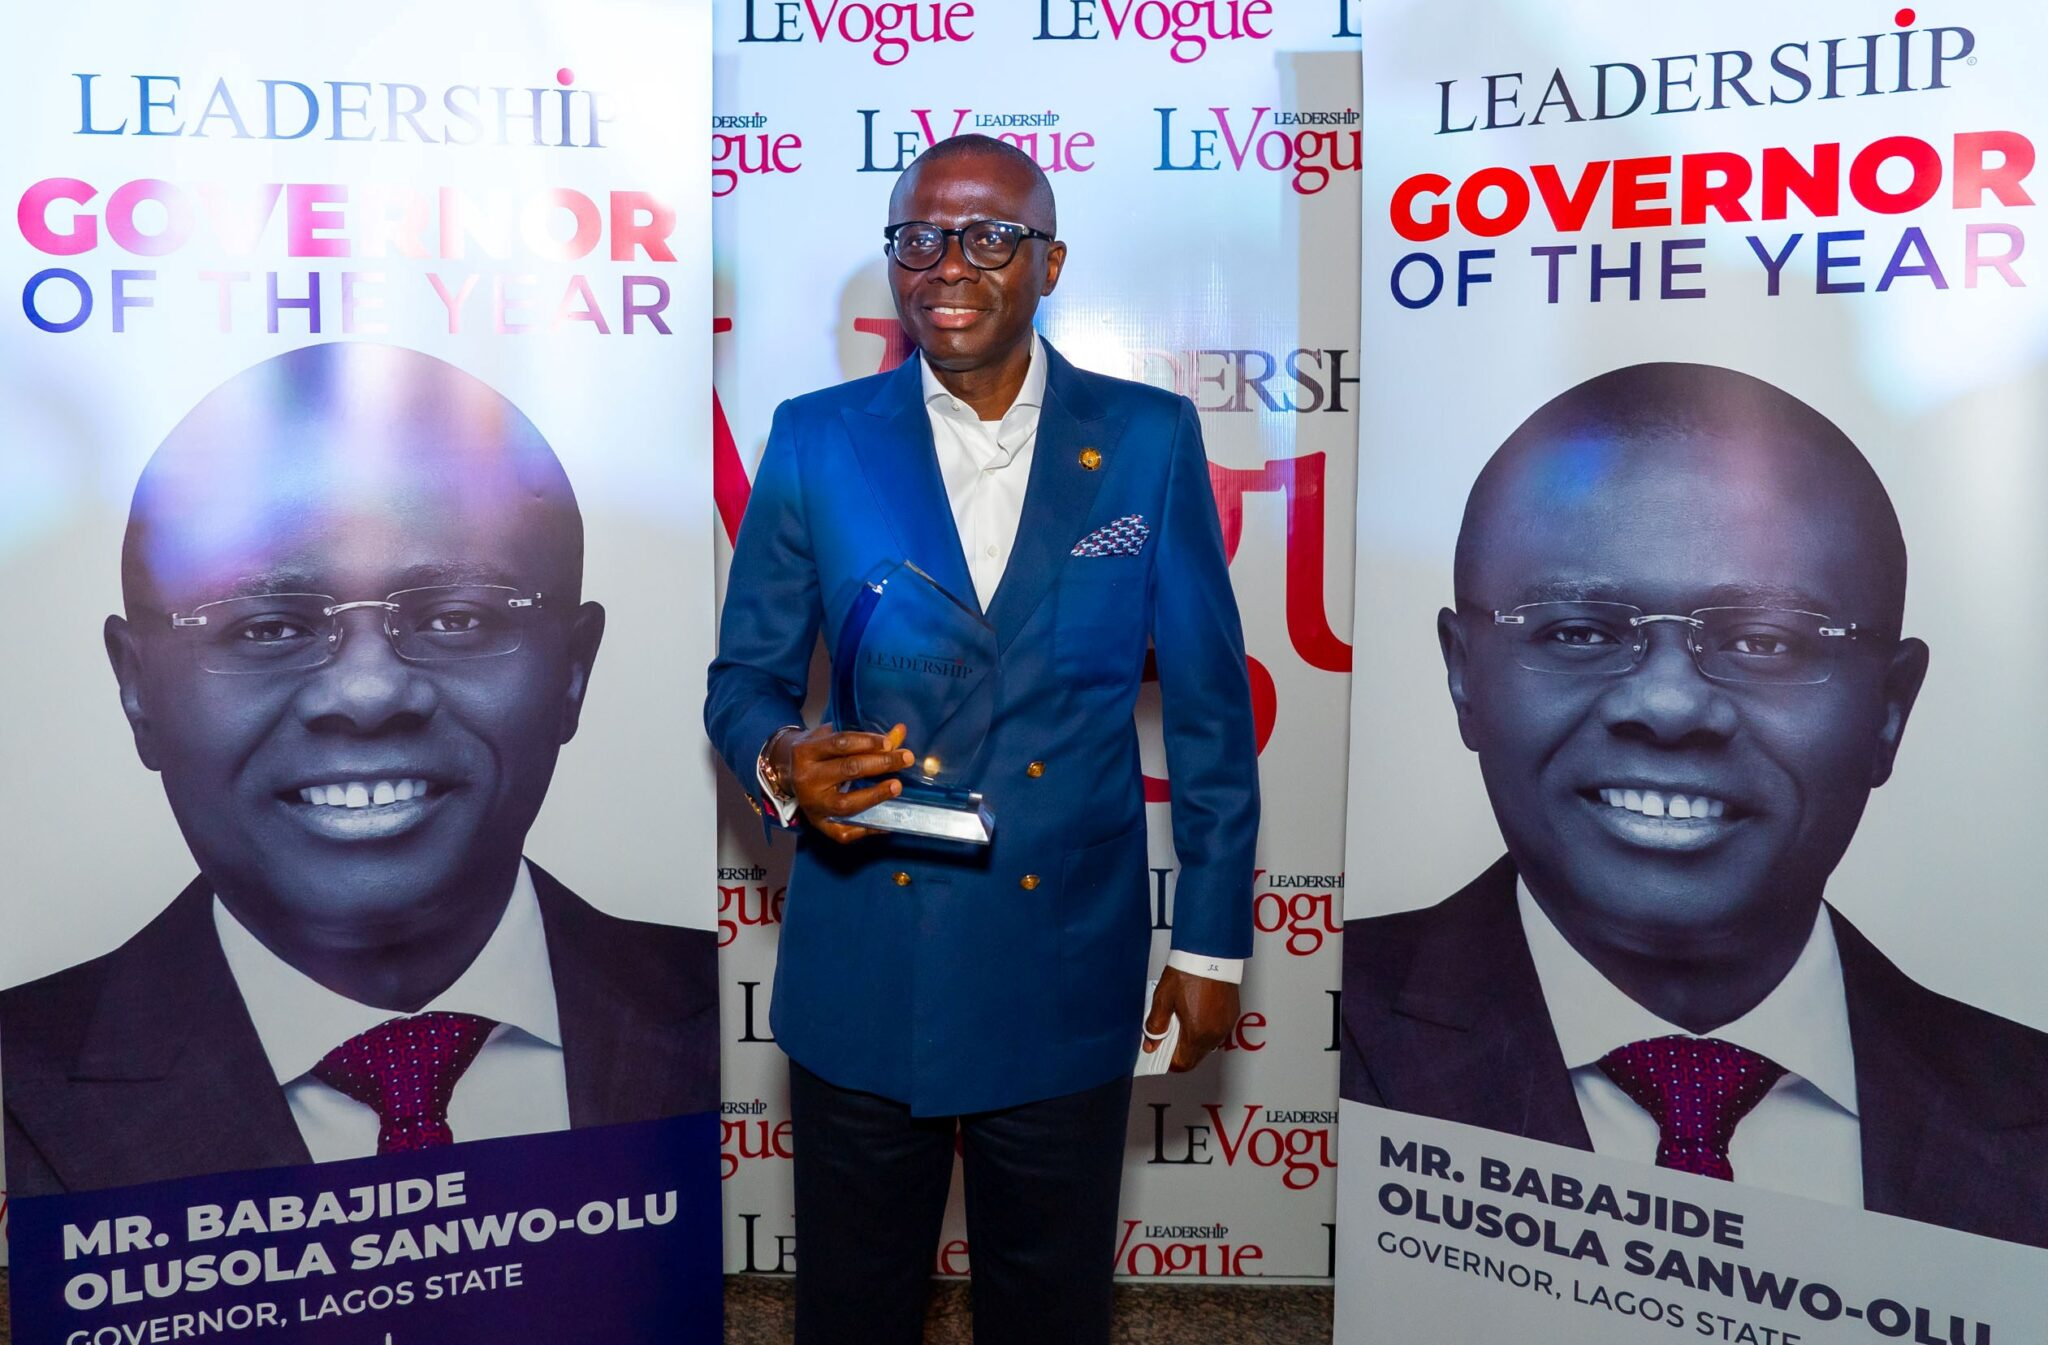 Sanwo-Olu Receives Leadership Governor Of The Year, Says Award Marks  Lagosians' Resilience – Yes International! Magazine